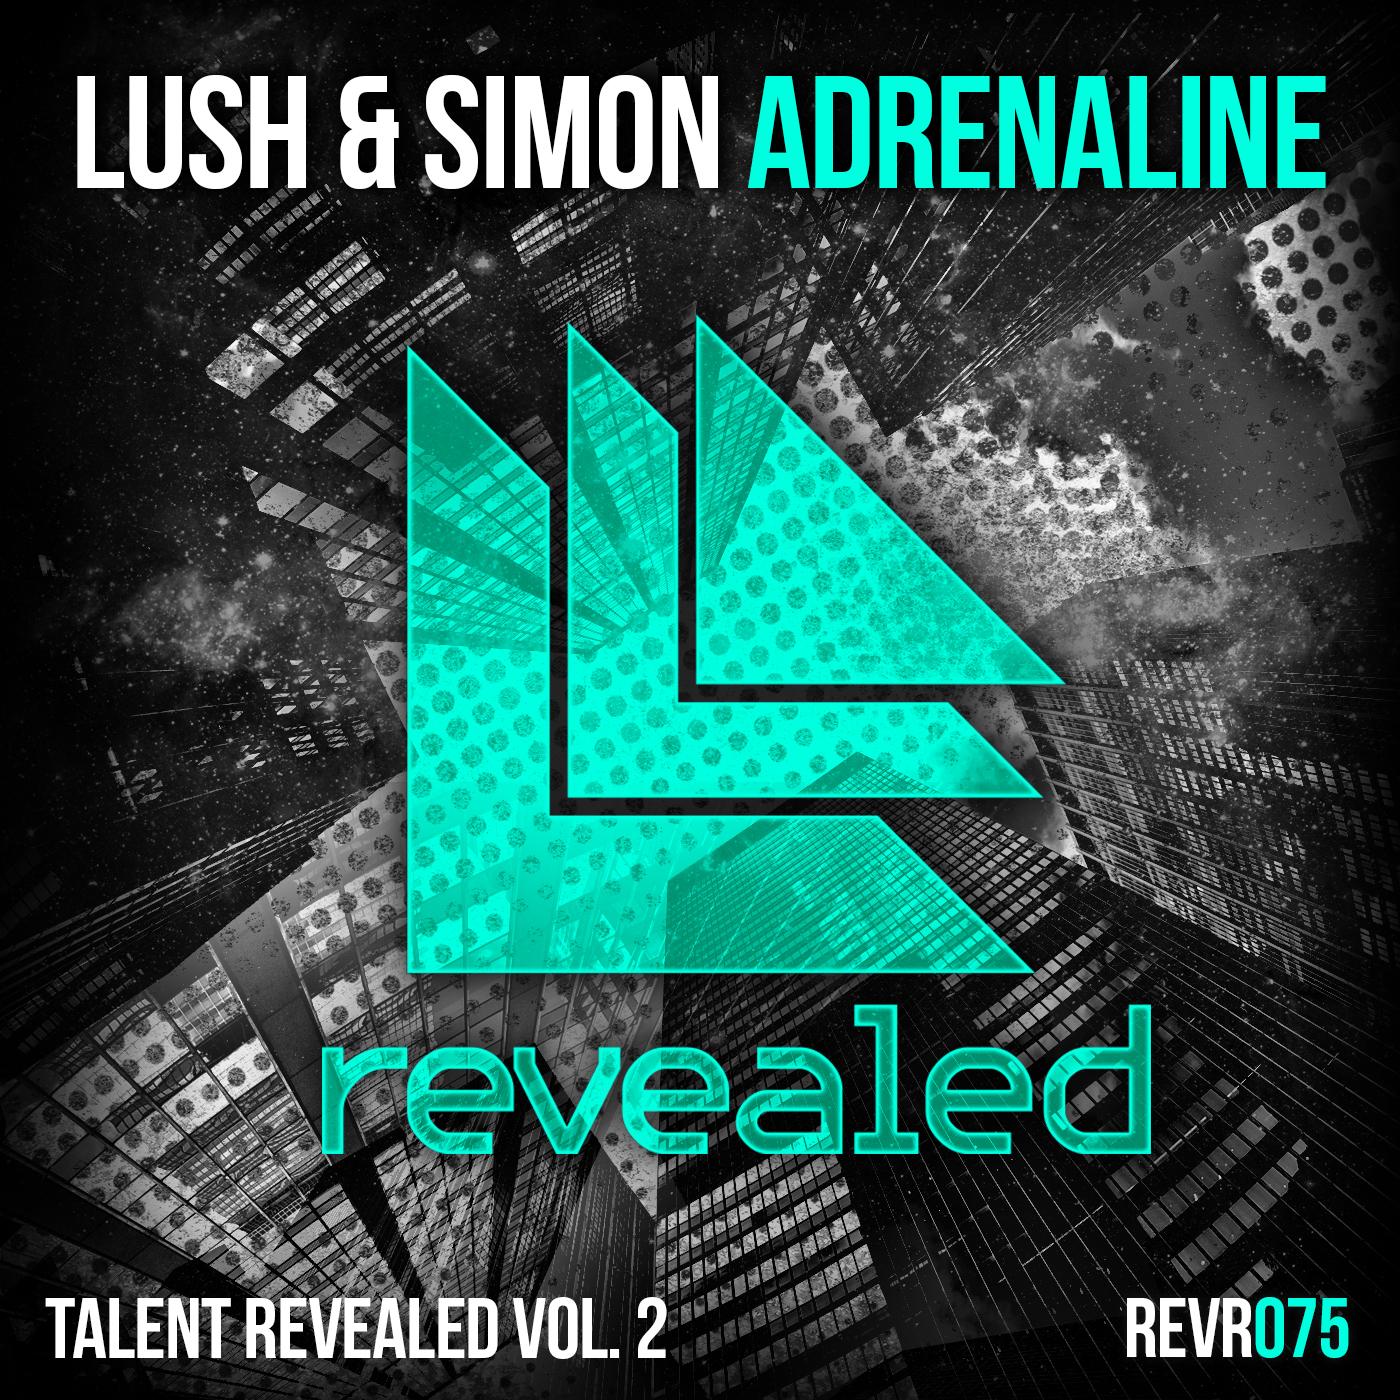 I Am Hardwell Album Lush & Simon - Adr...